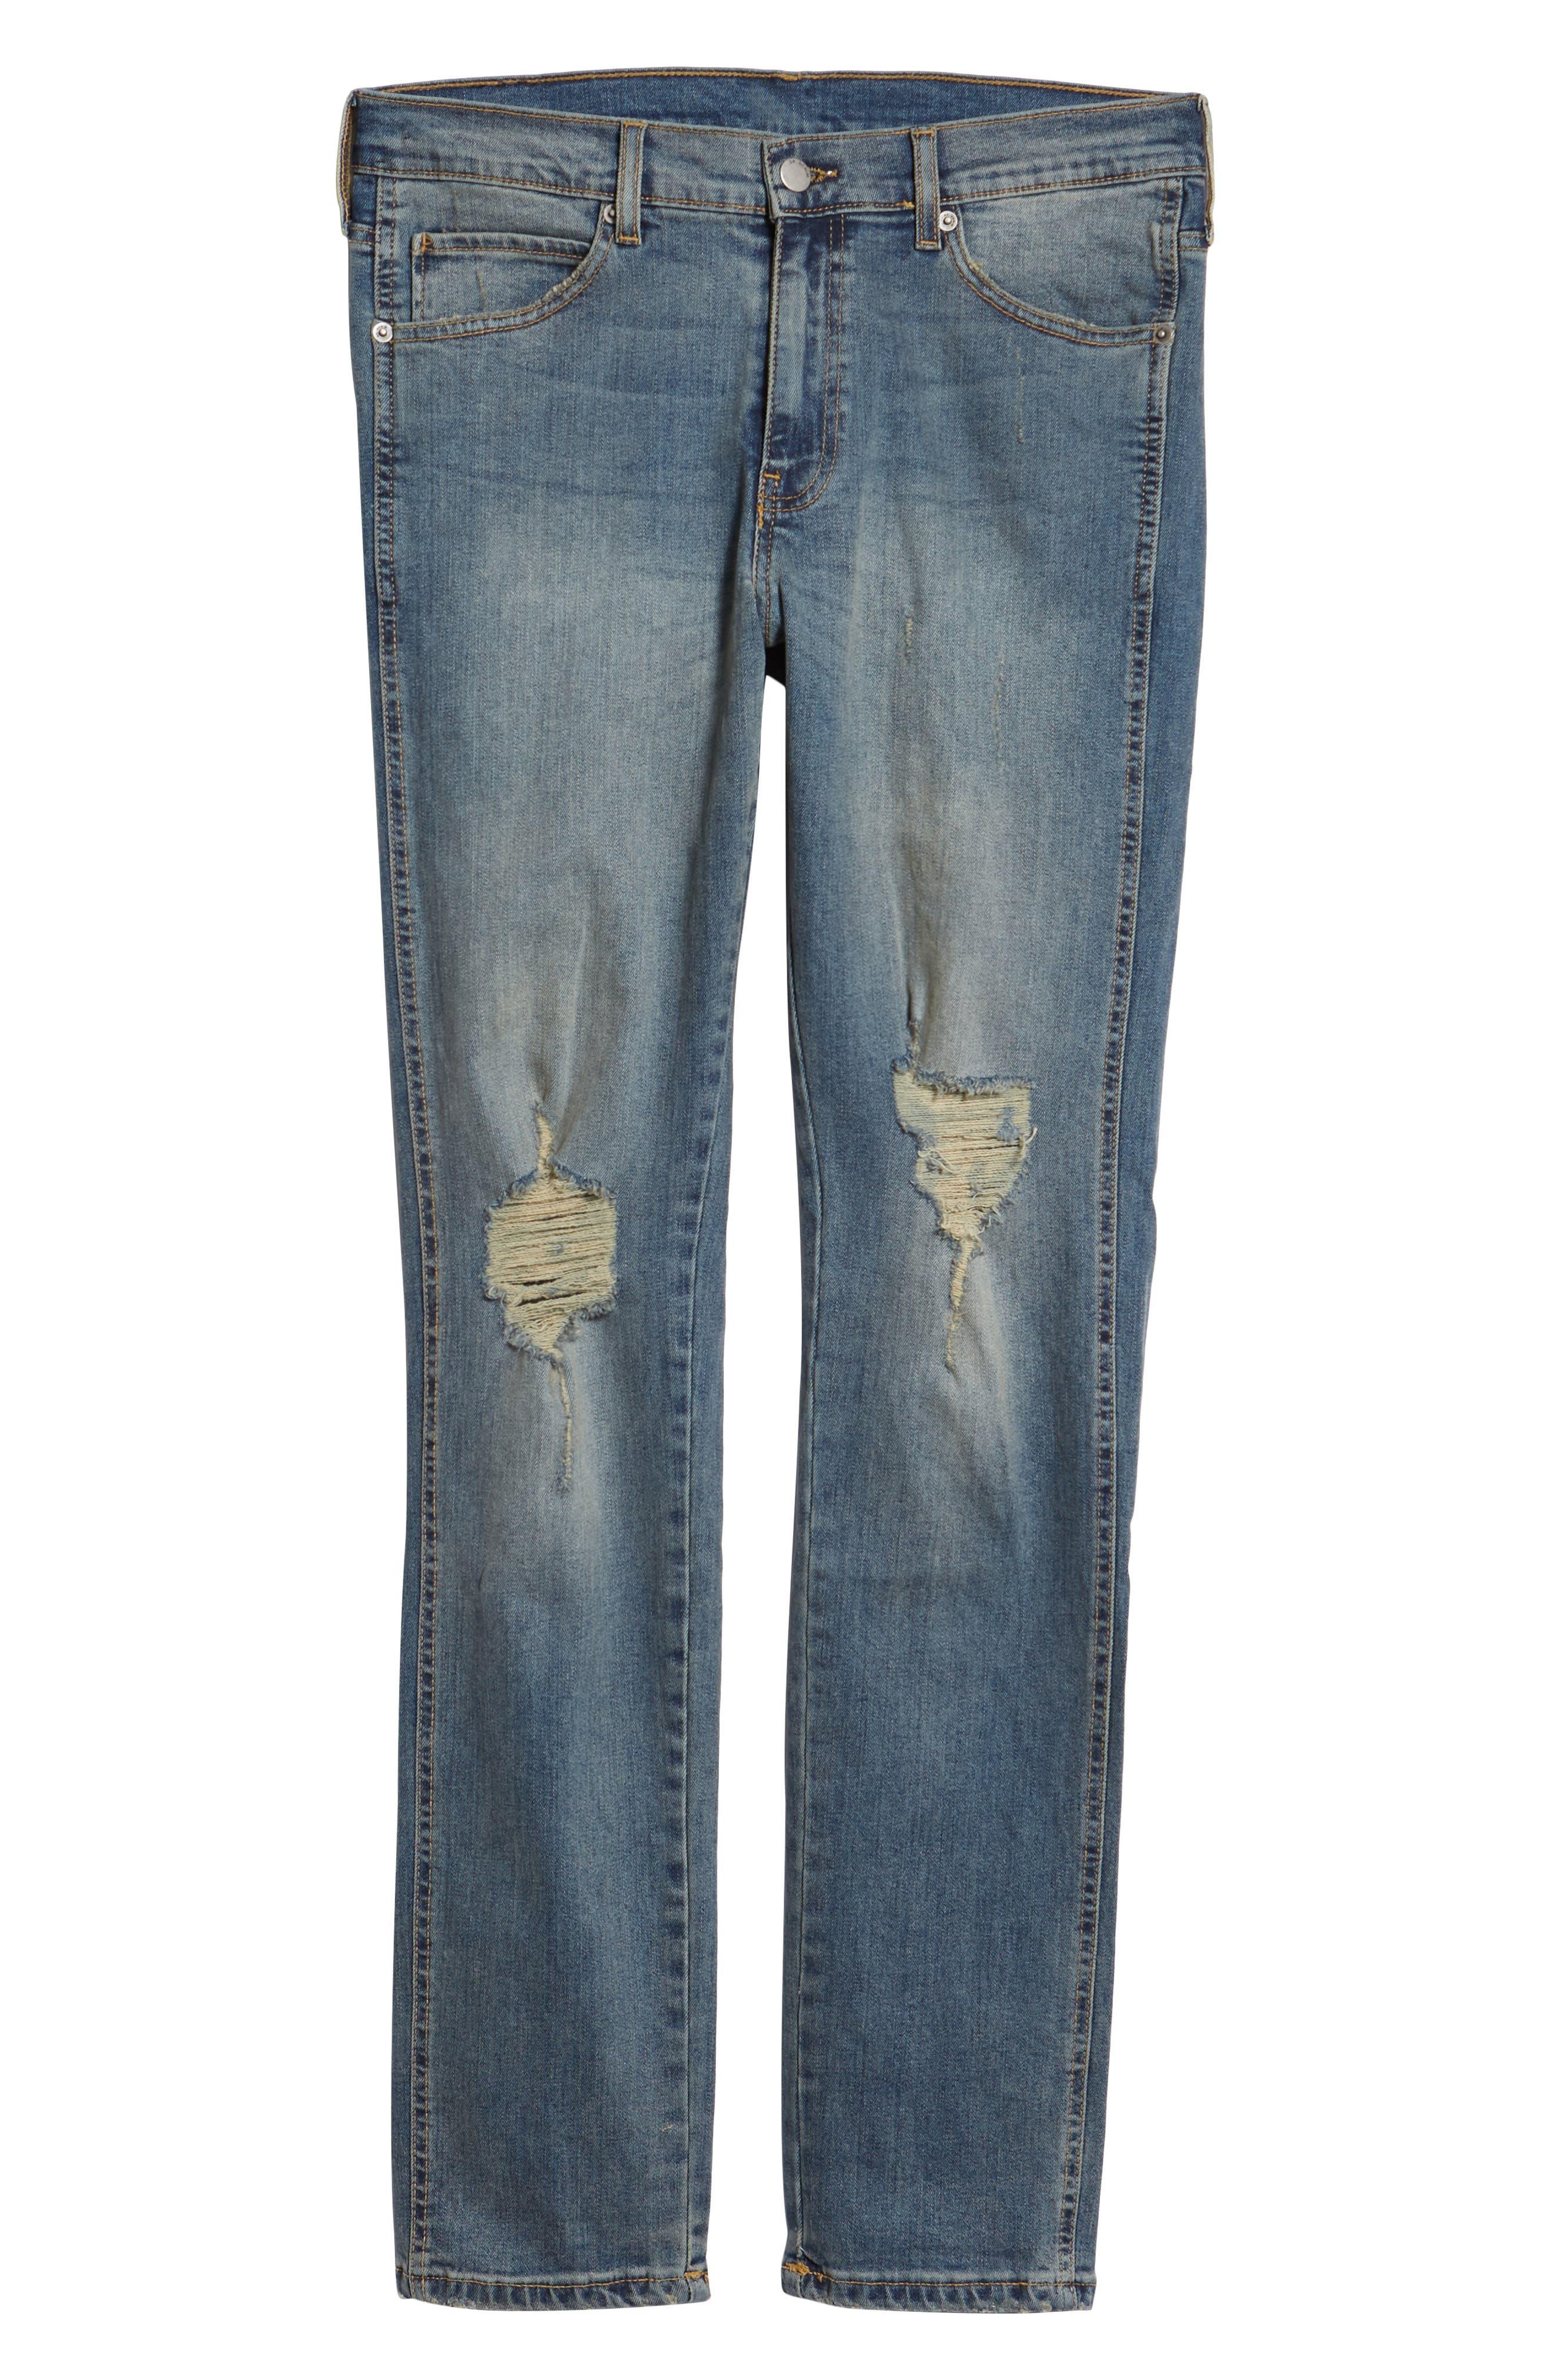 Snap Skinny Fit Jeans,                             Alternate thumbnail 6, color,                             LIGHT OLD DESTROY